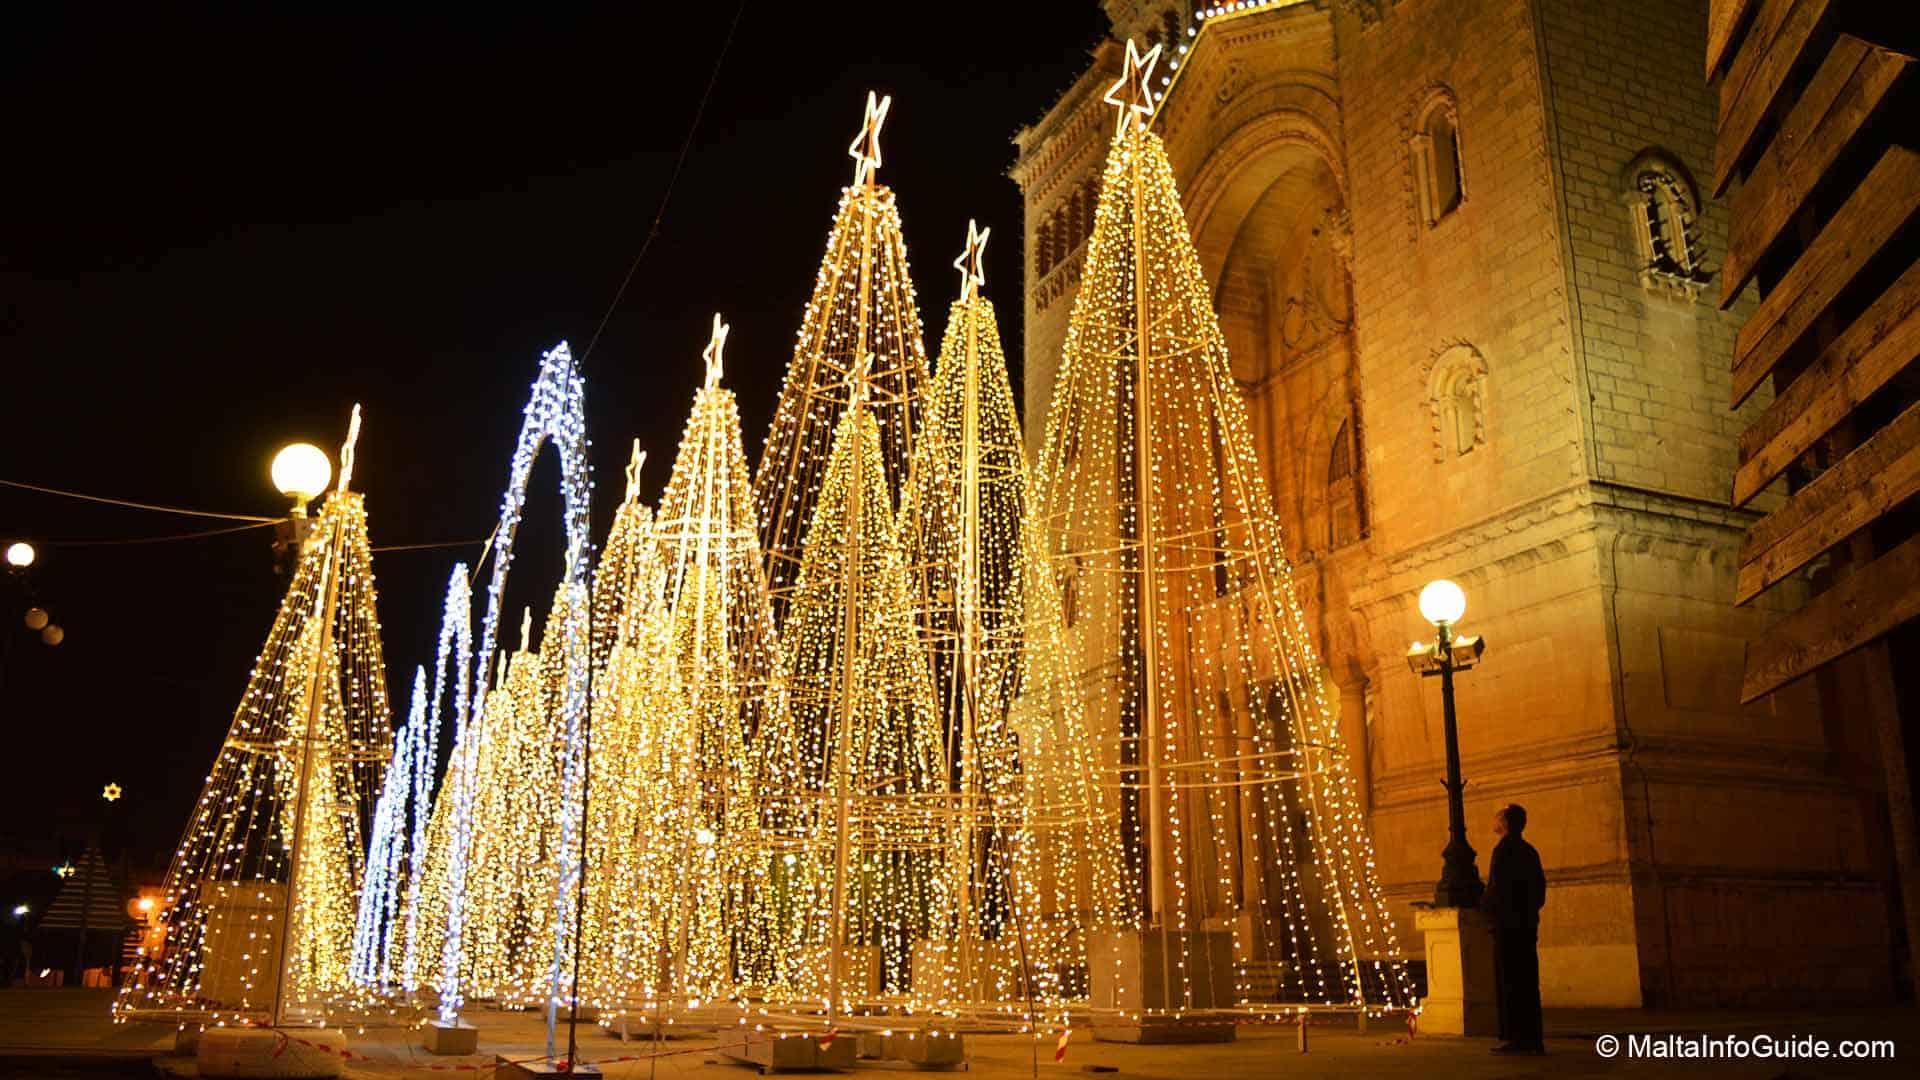 The iconic Christmas Trees in Birzebbugia